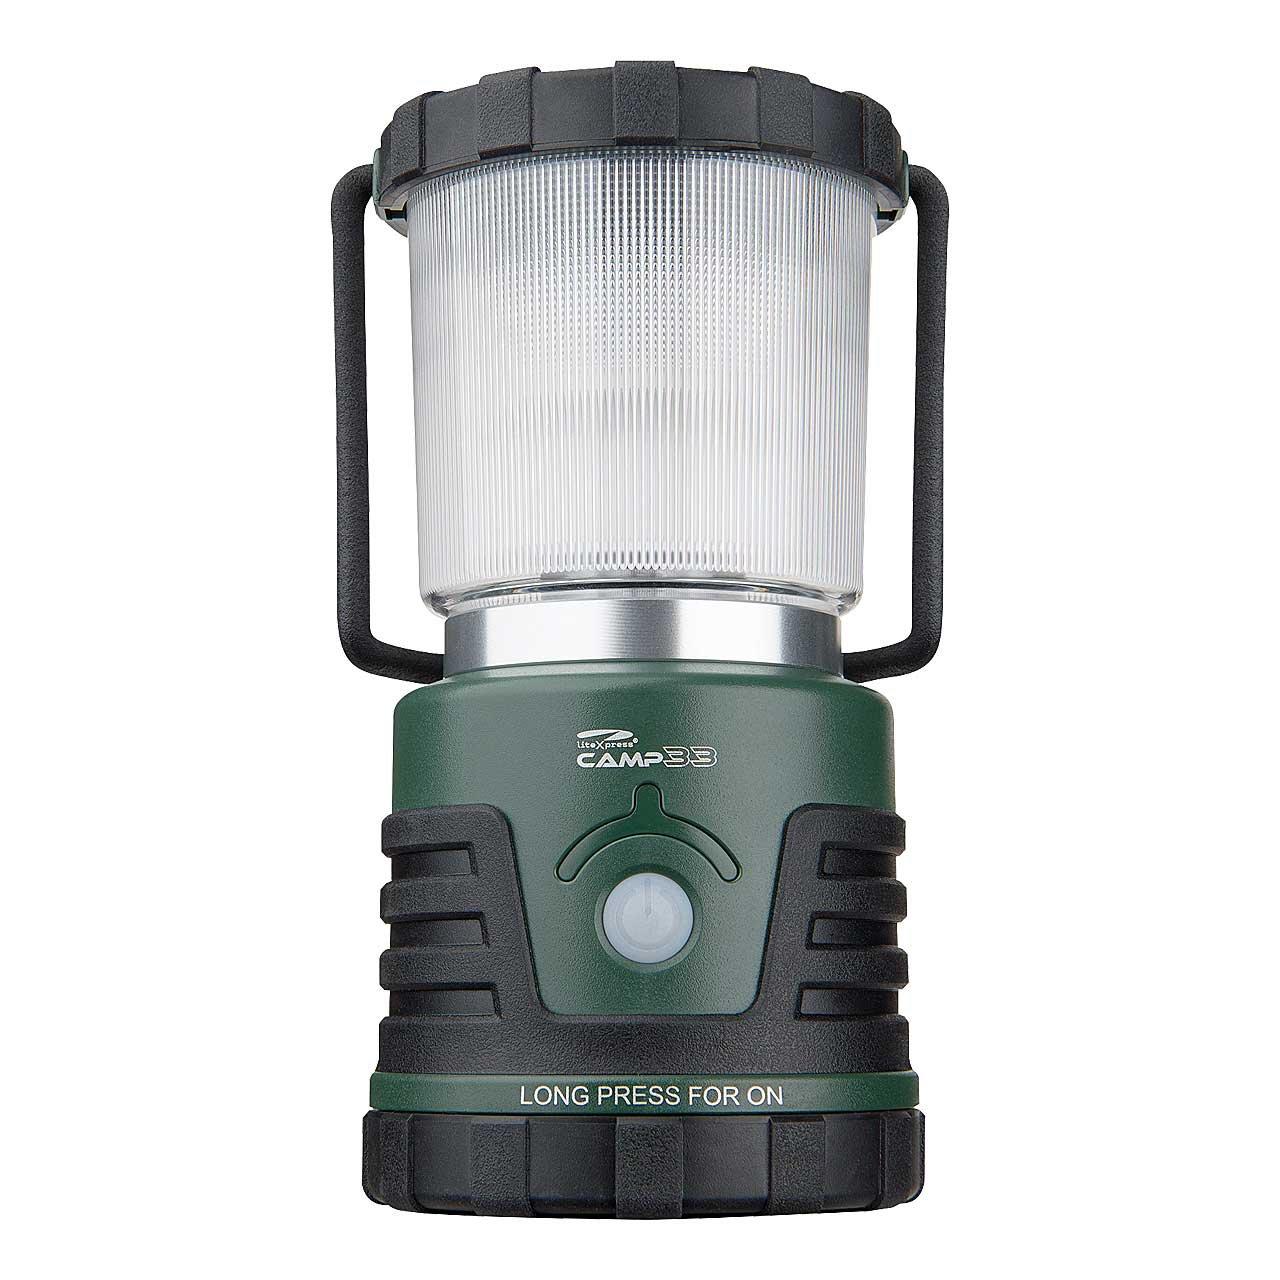 CAMP 33 LED Laterne